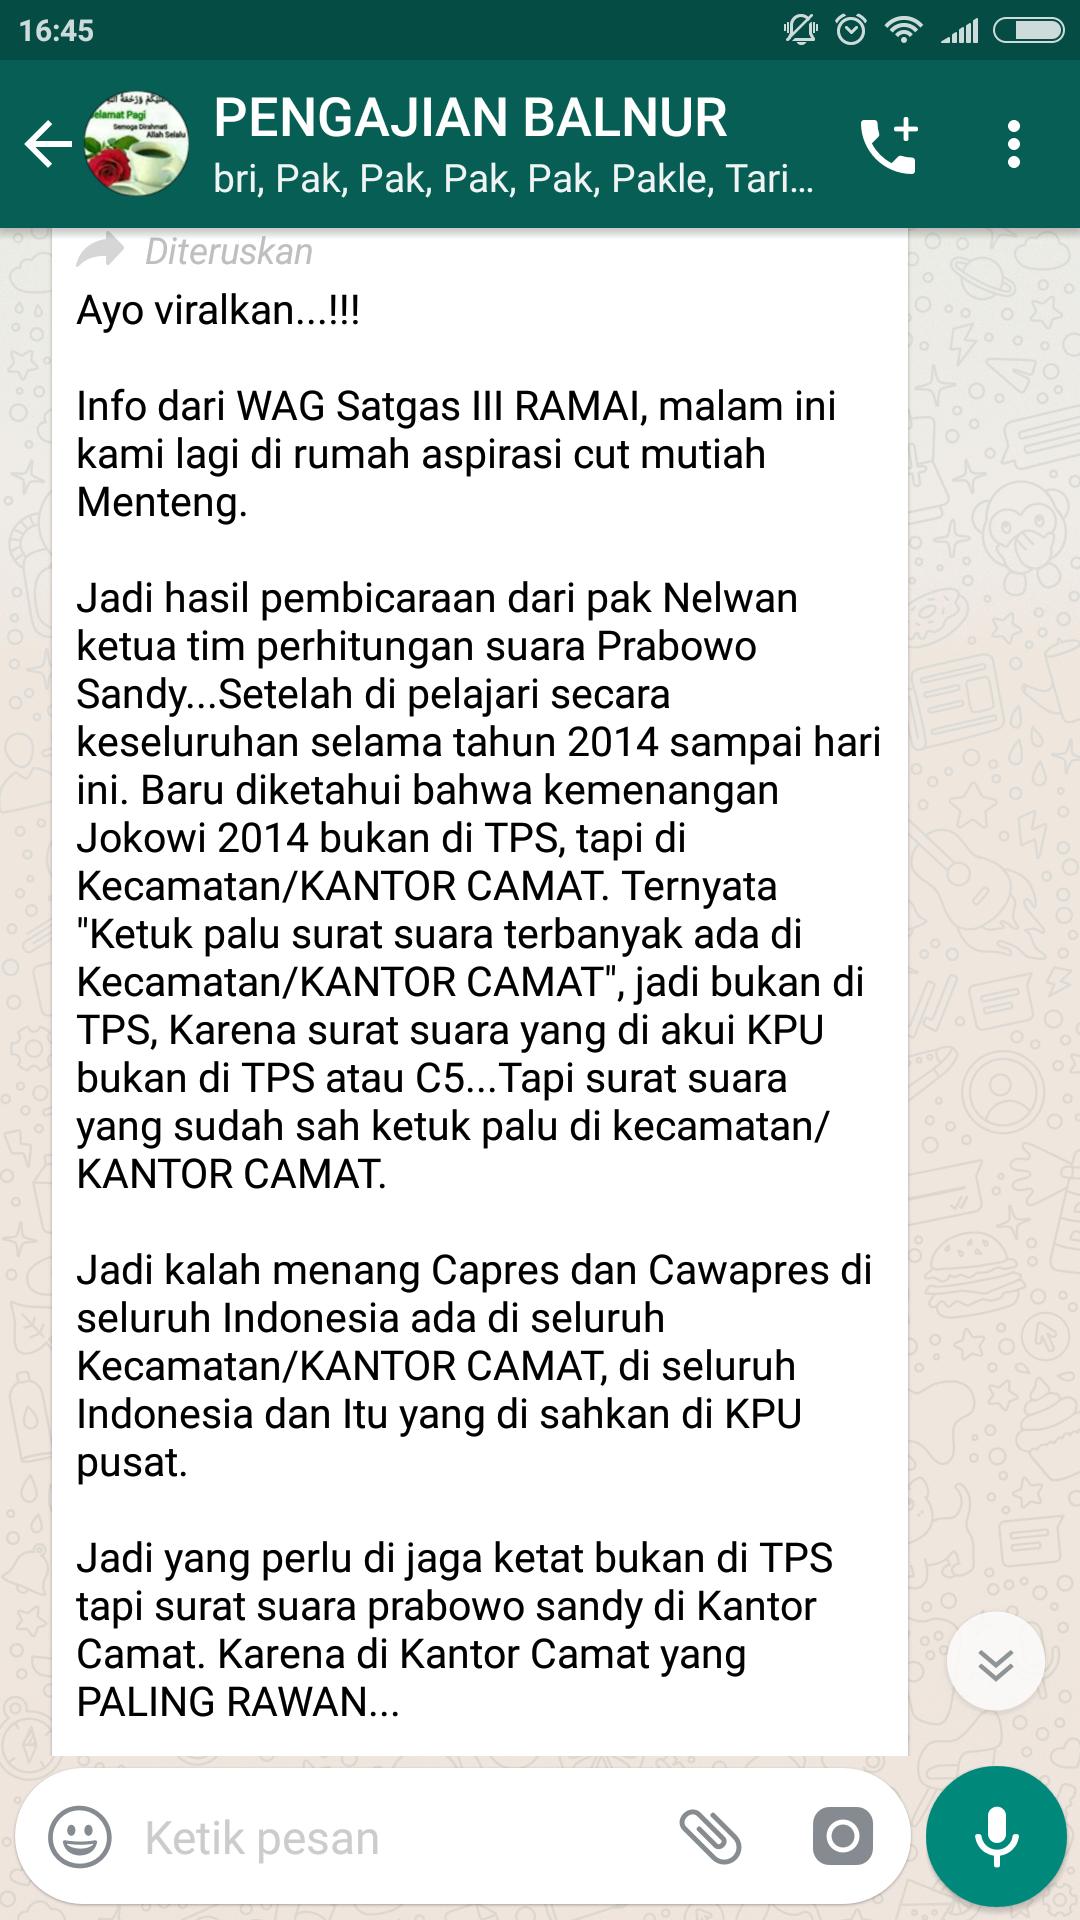 Screenshot_2019-04-14-16-45-14_com whatsapp png - Hoax